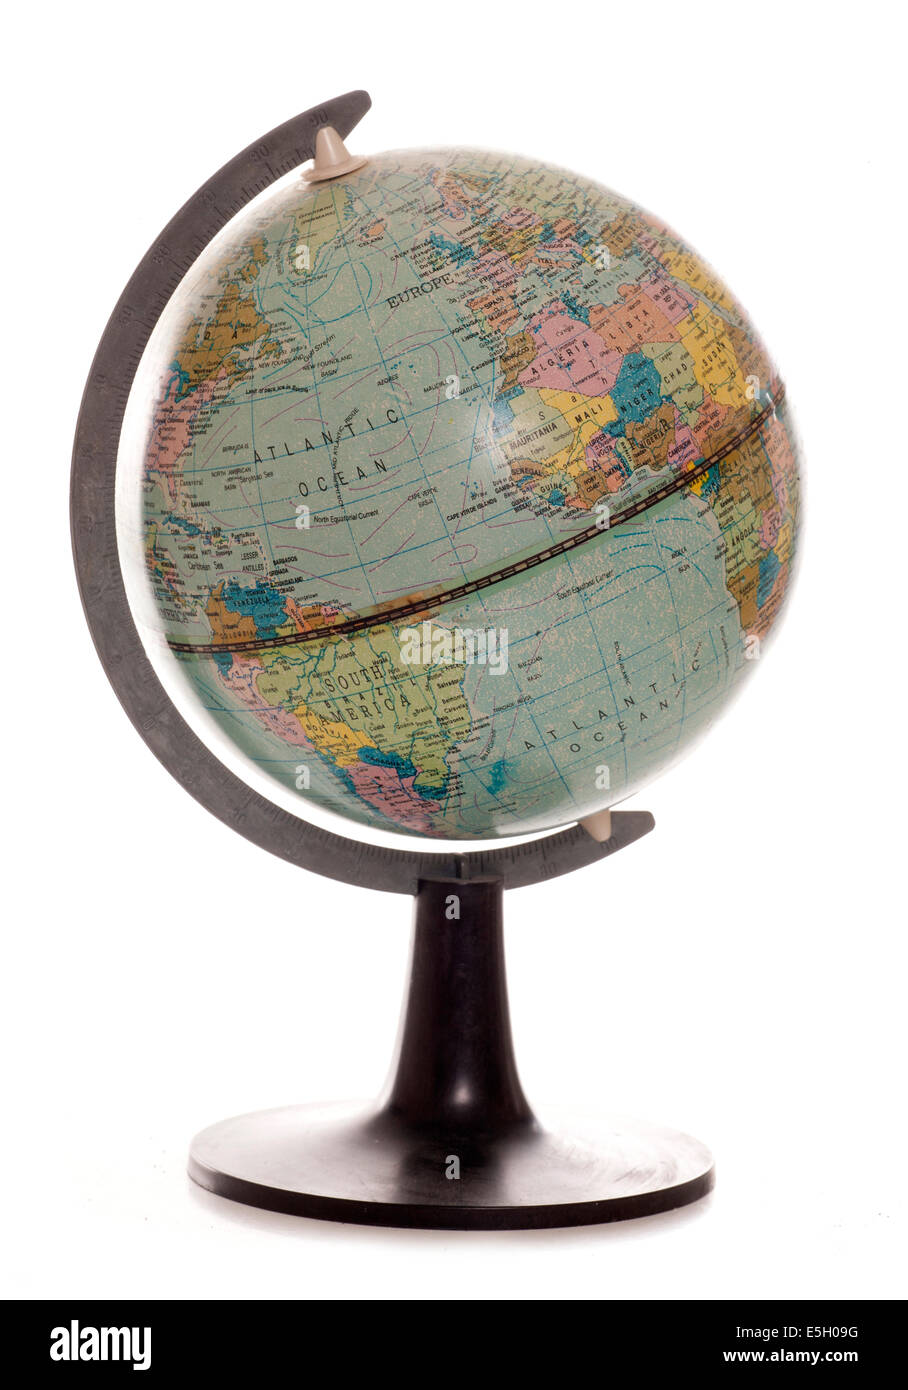 vintage desk globe studio cutout - Vintage Desk Globe Studio Cutout Stock Photo: 72288204 - Alamy